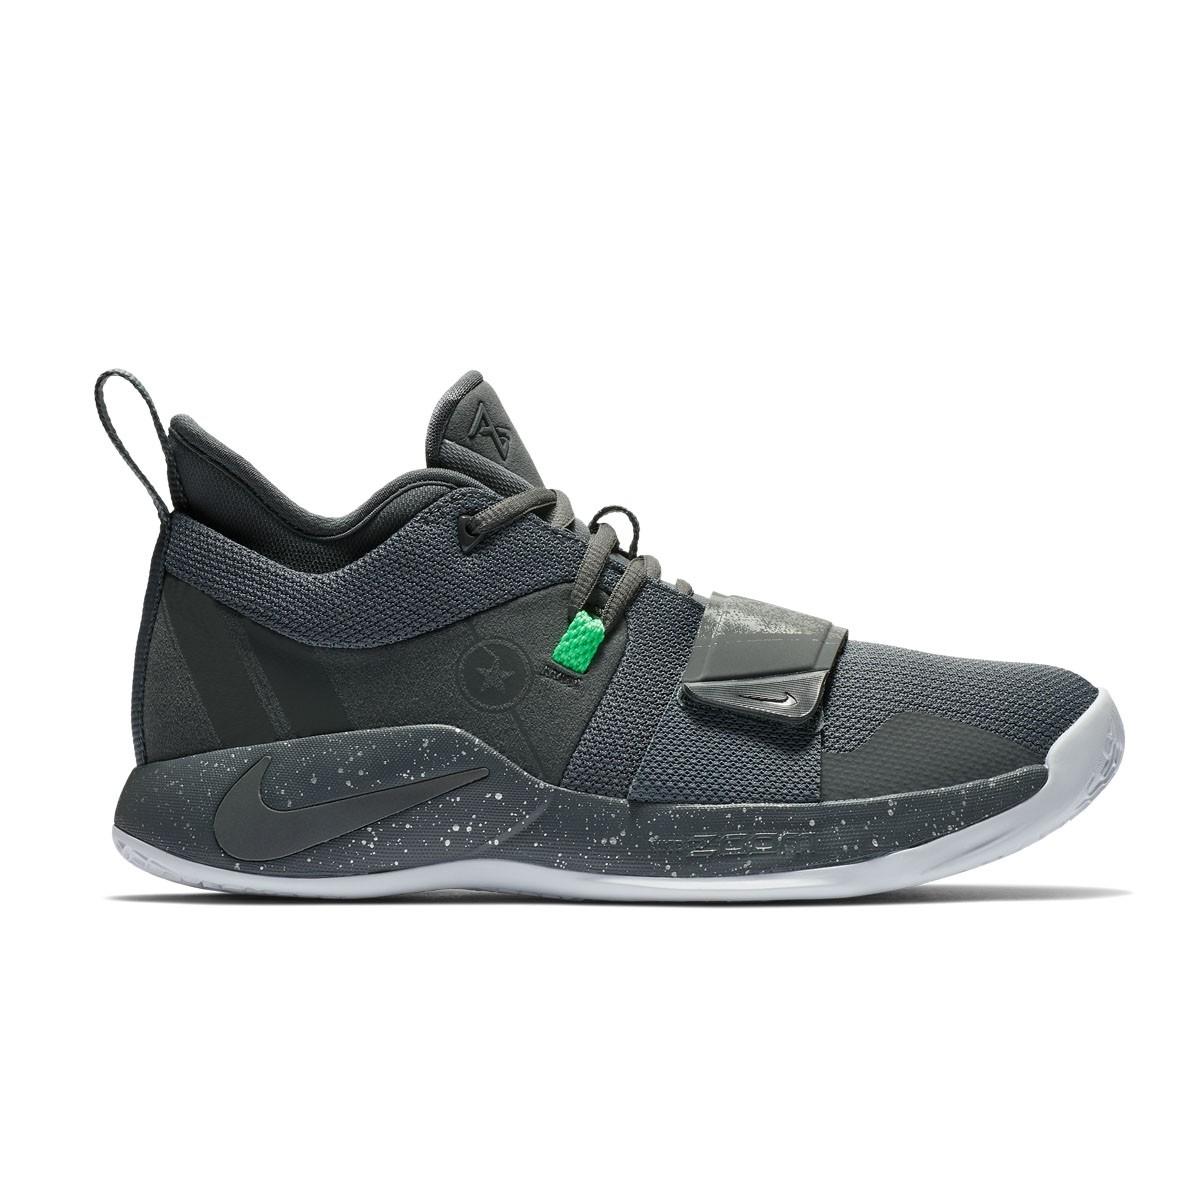 Nike PG 2.5 'Fighter Jet'